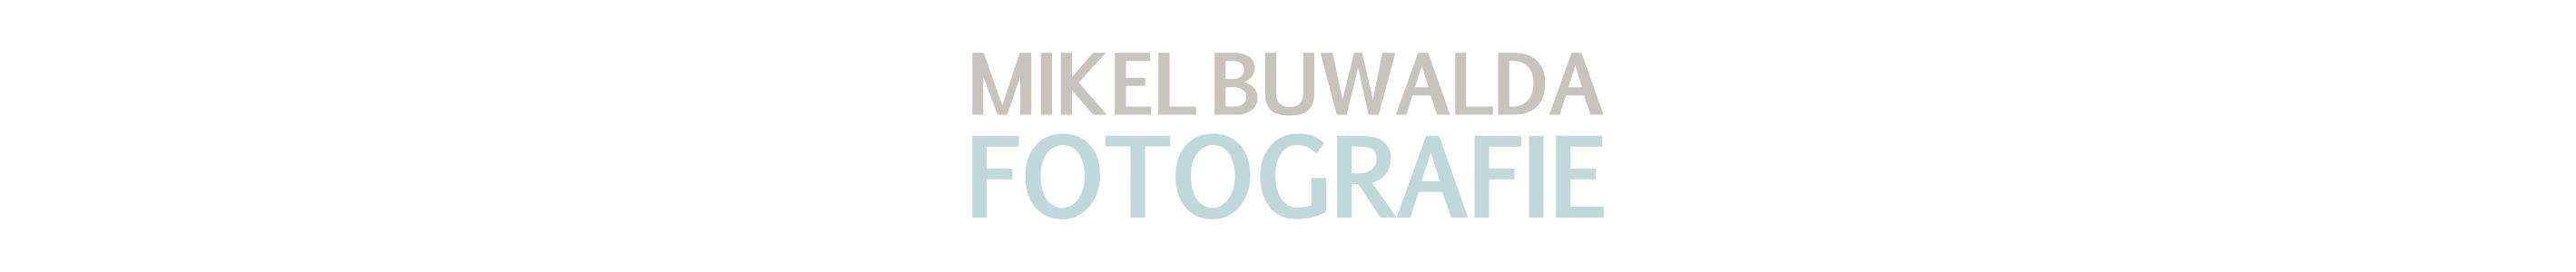 Mikel Buwalda Fotografie Logo